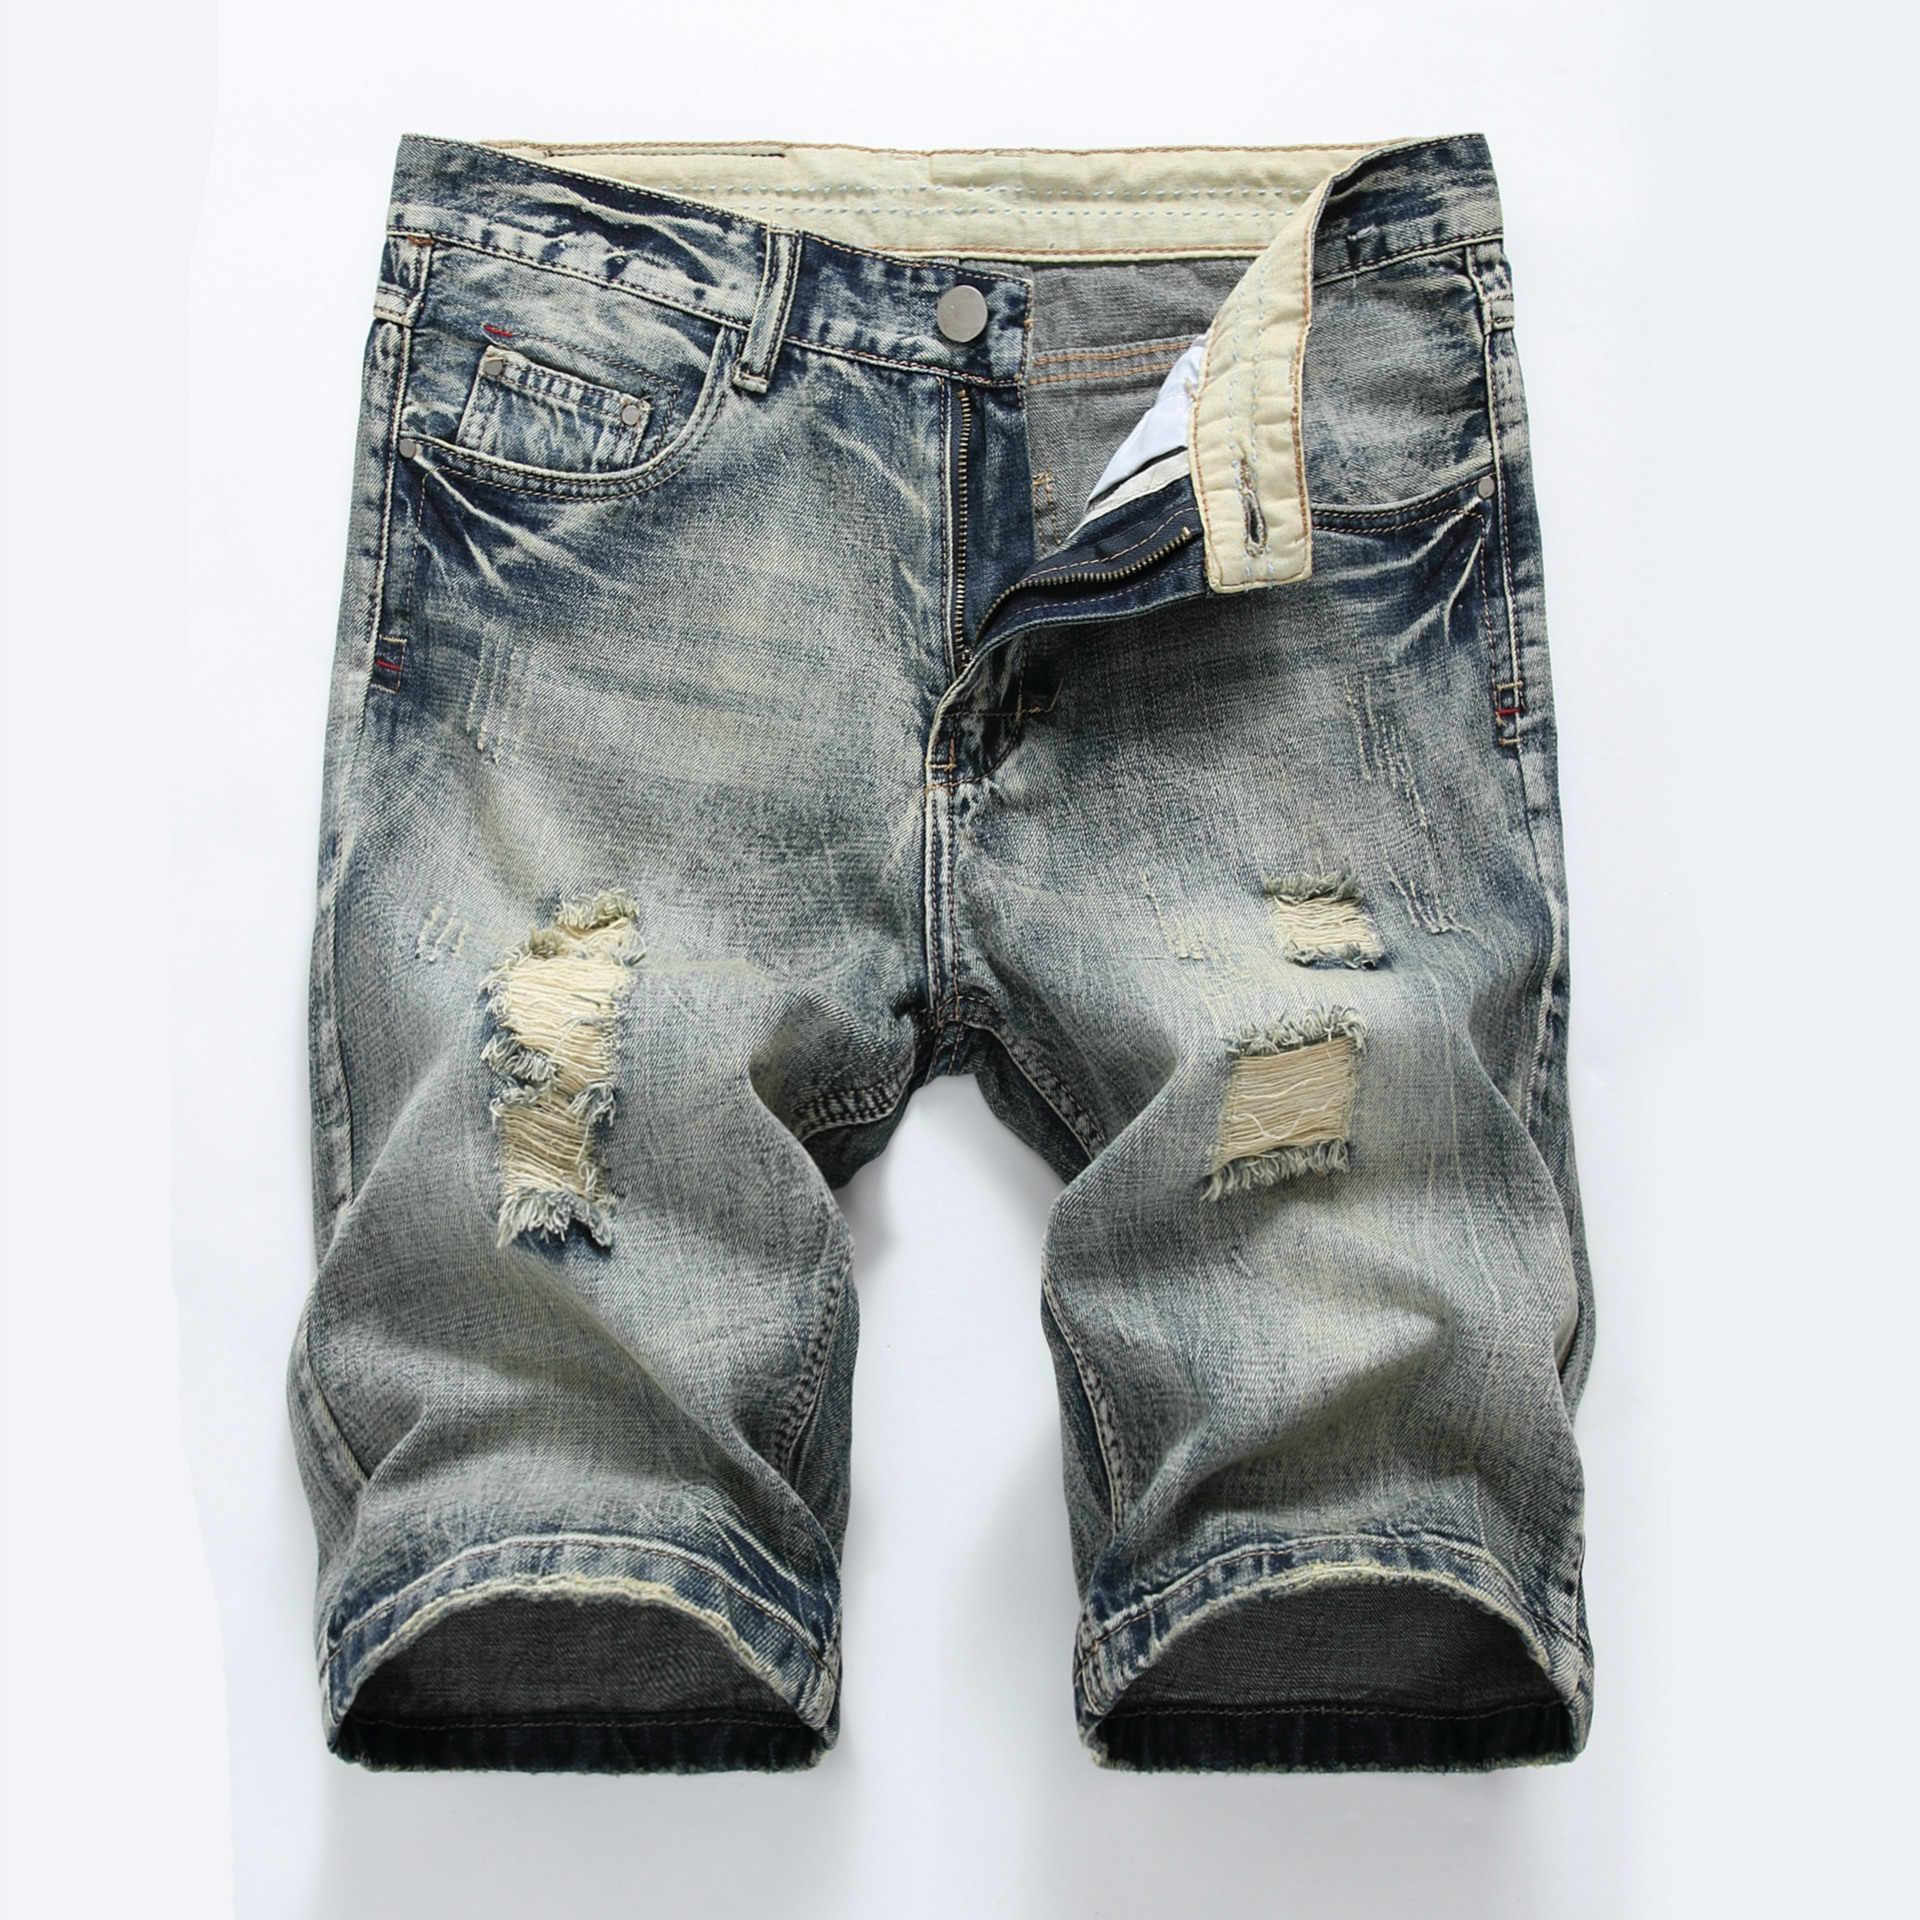 f5d3d4f748 Summer cotton hole denim shorts male ripped jeans retro men jean shorts  bermuda skate board harem